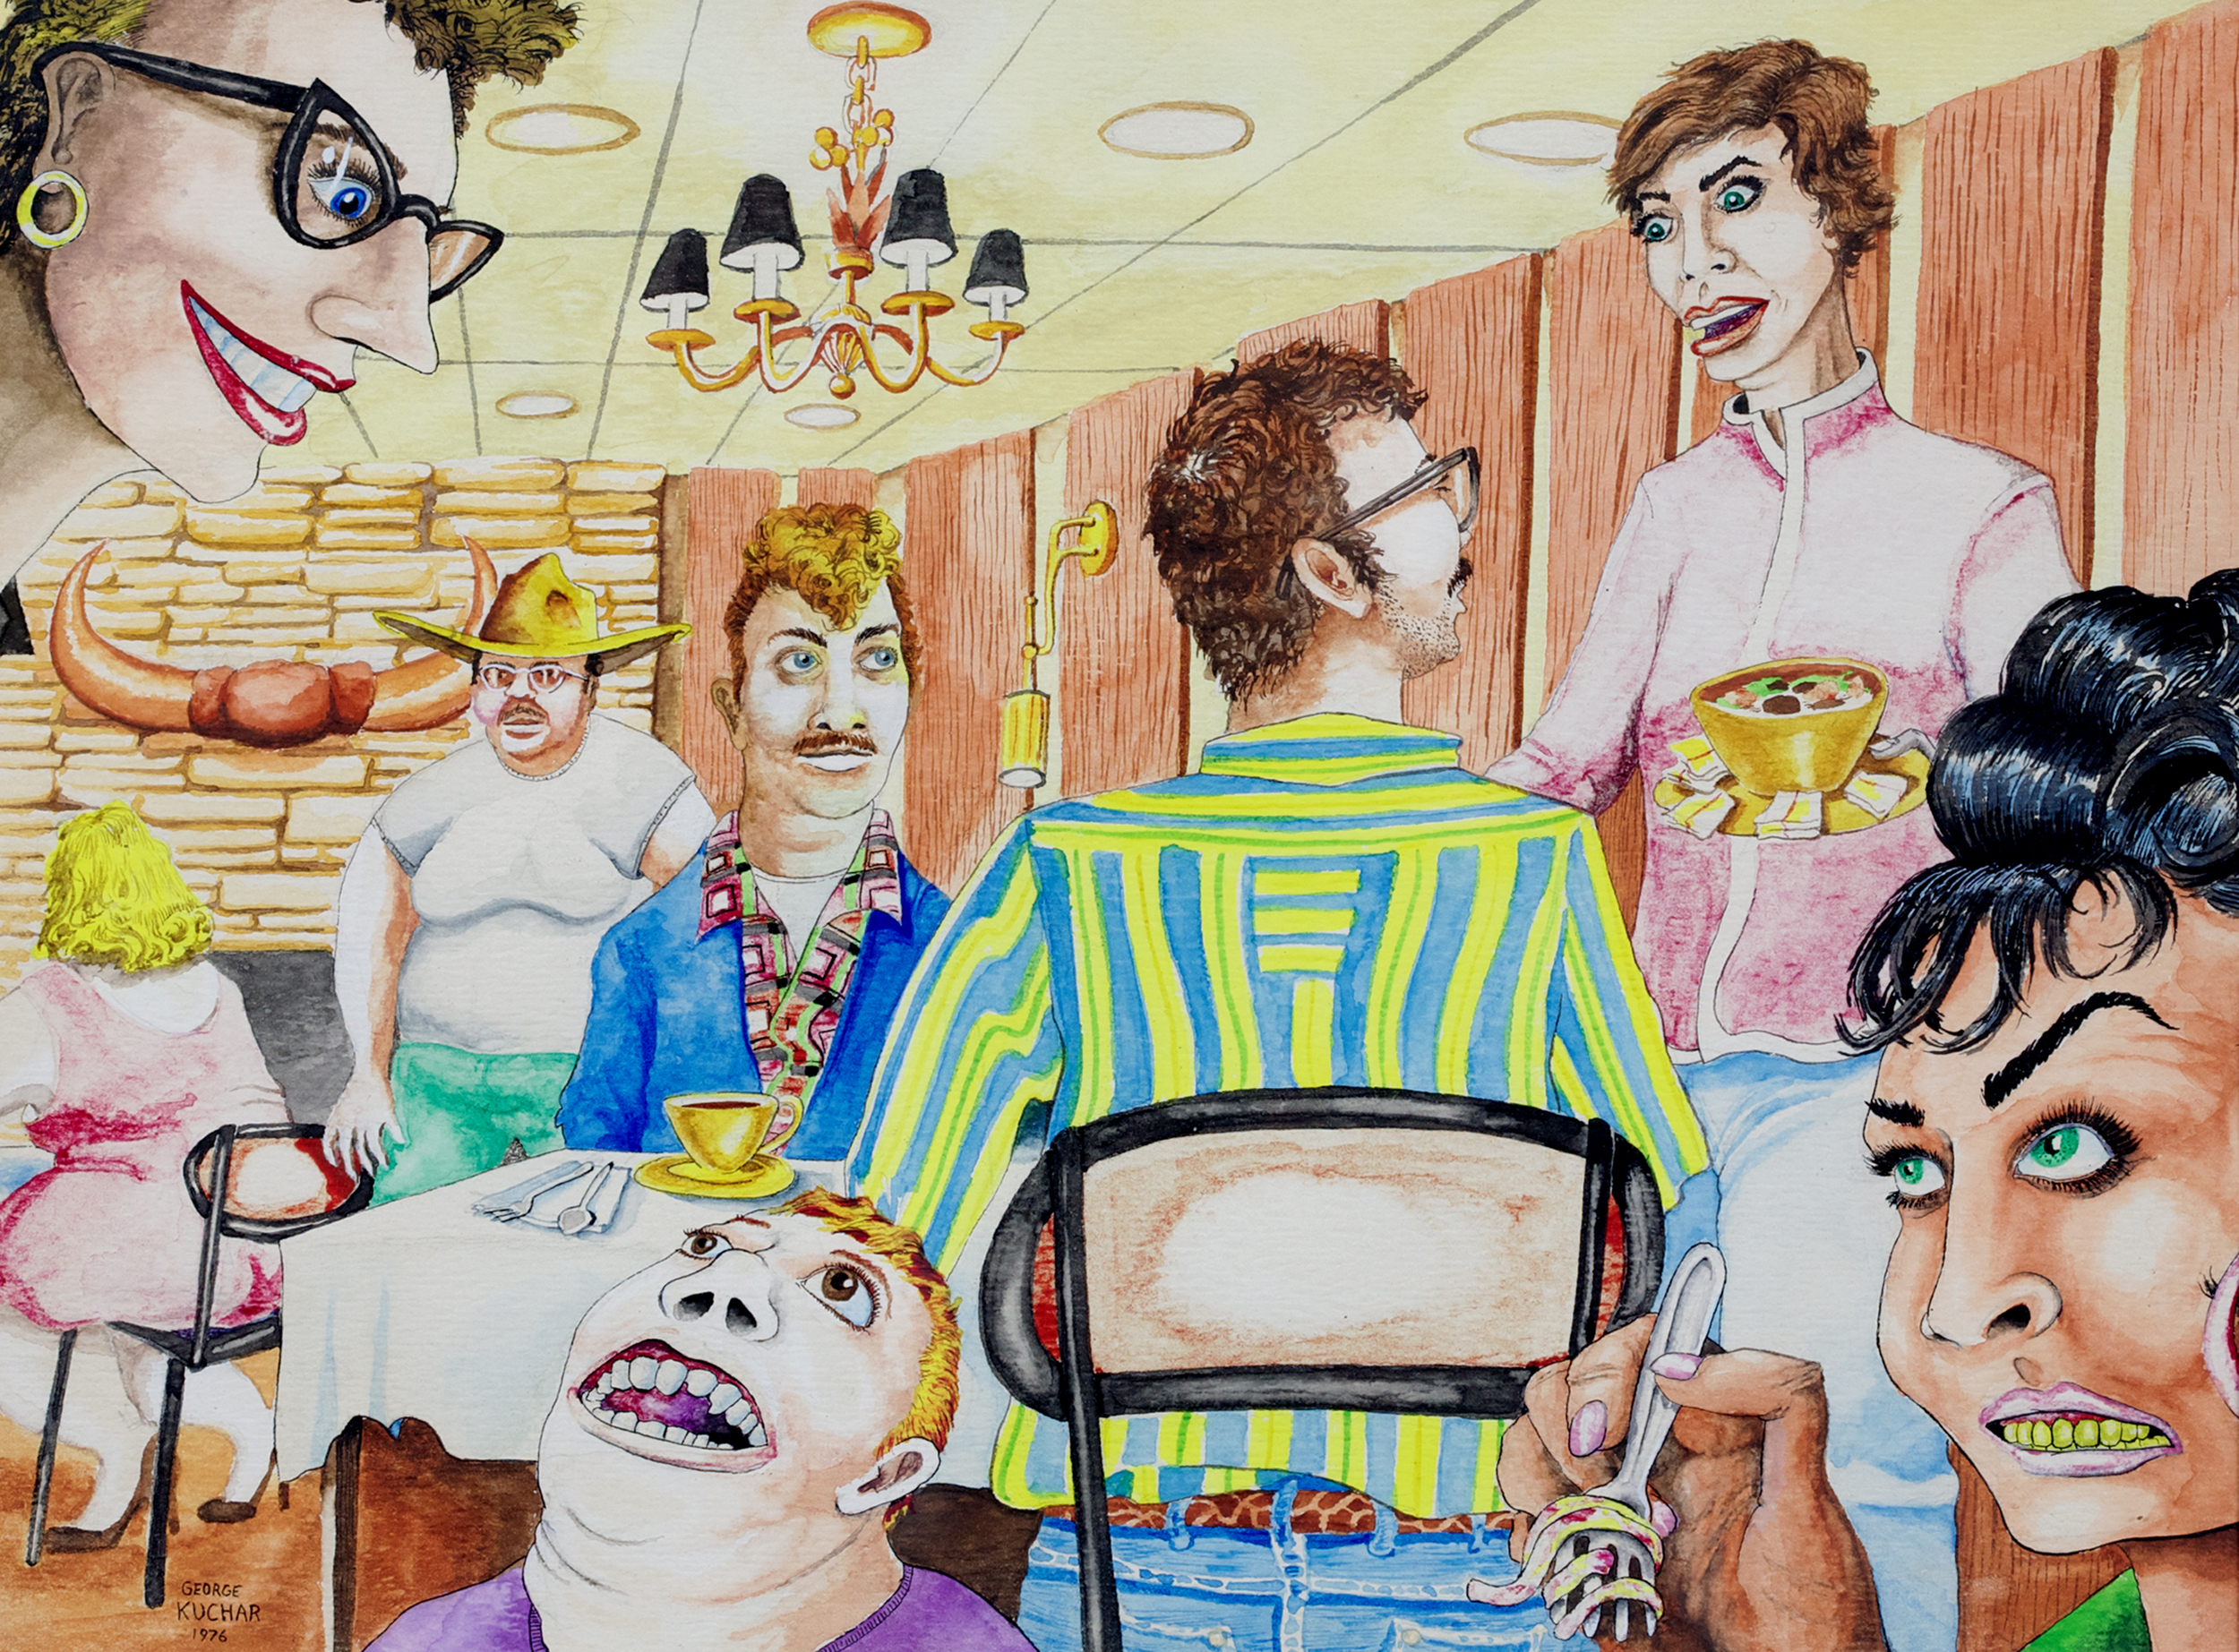 George Kuchar,  Chowdown in El Reno,  1976, watercolor on paper, 9 x 12 inches, © Kuchar Brothers Trust.